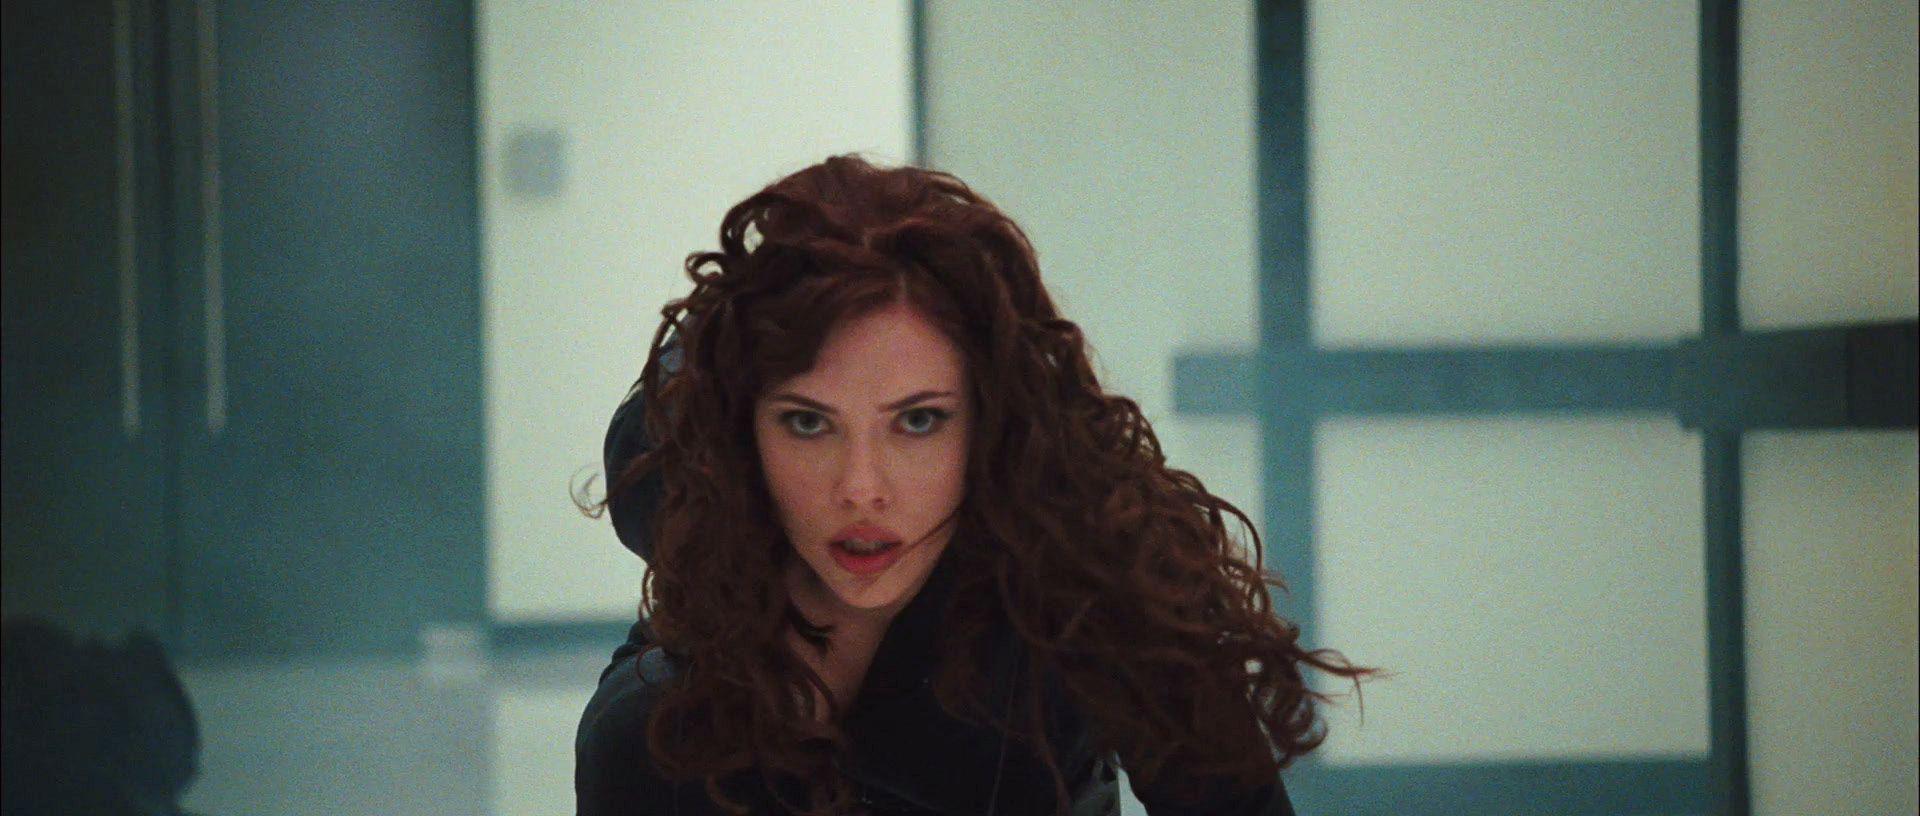 Scarlett johansson scarlett johansson iron man 2 trailer screencaps